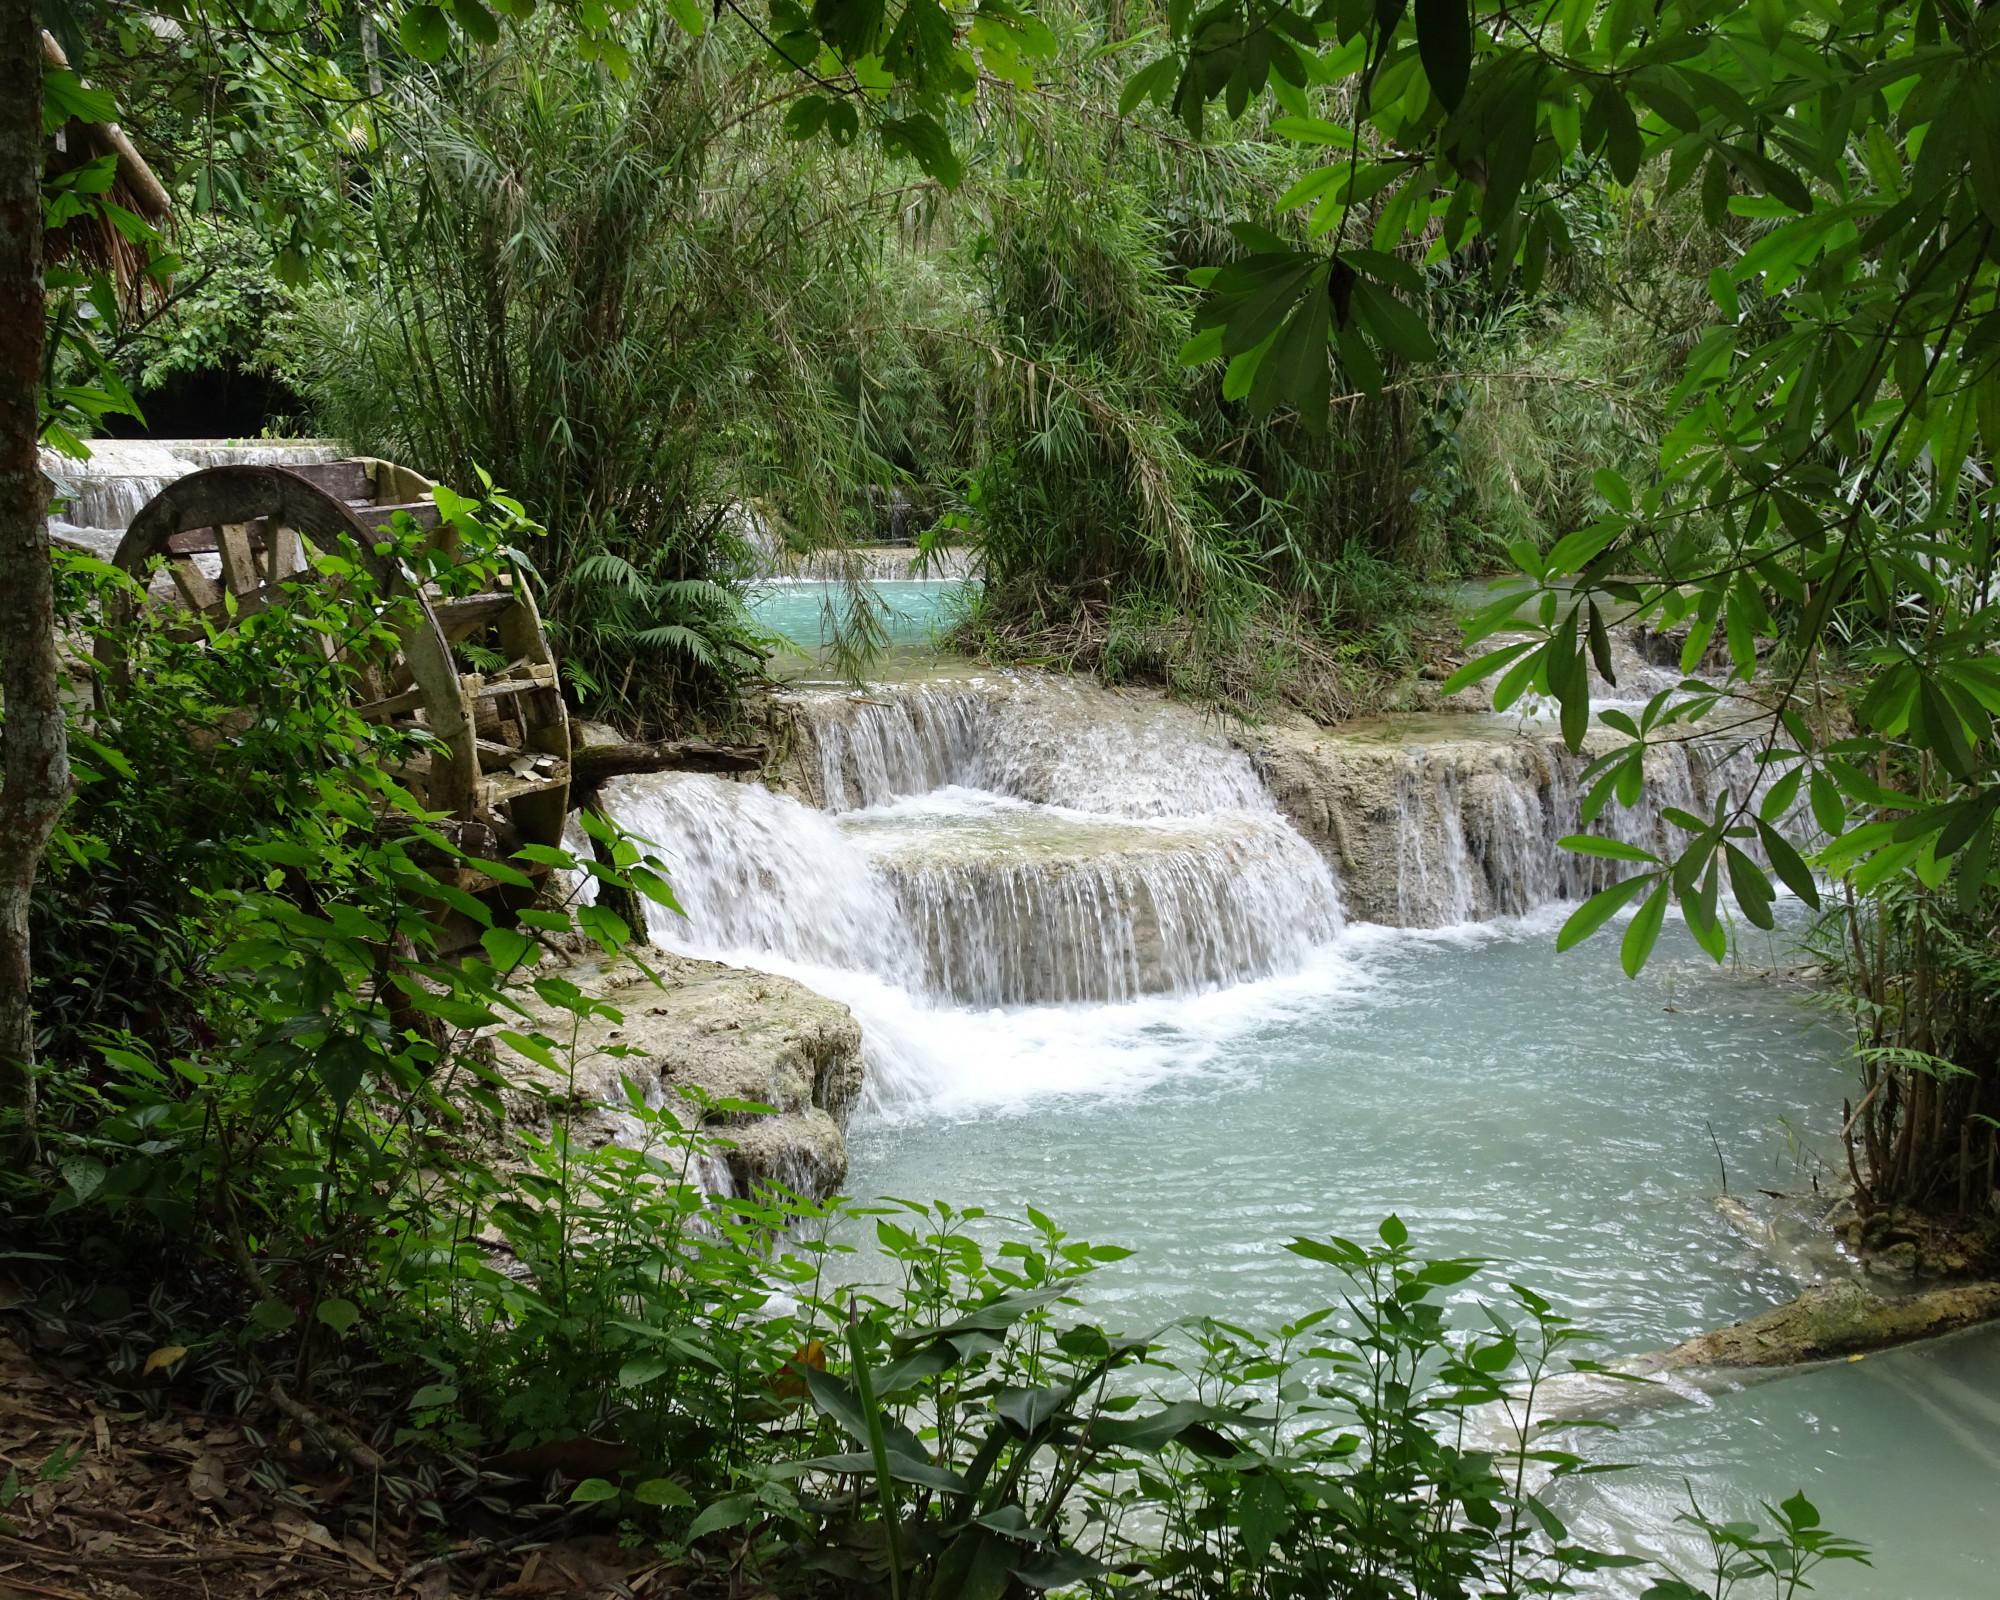 Photo 2: Kuang Si falls, irréelles et somptueuses !